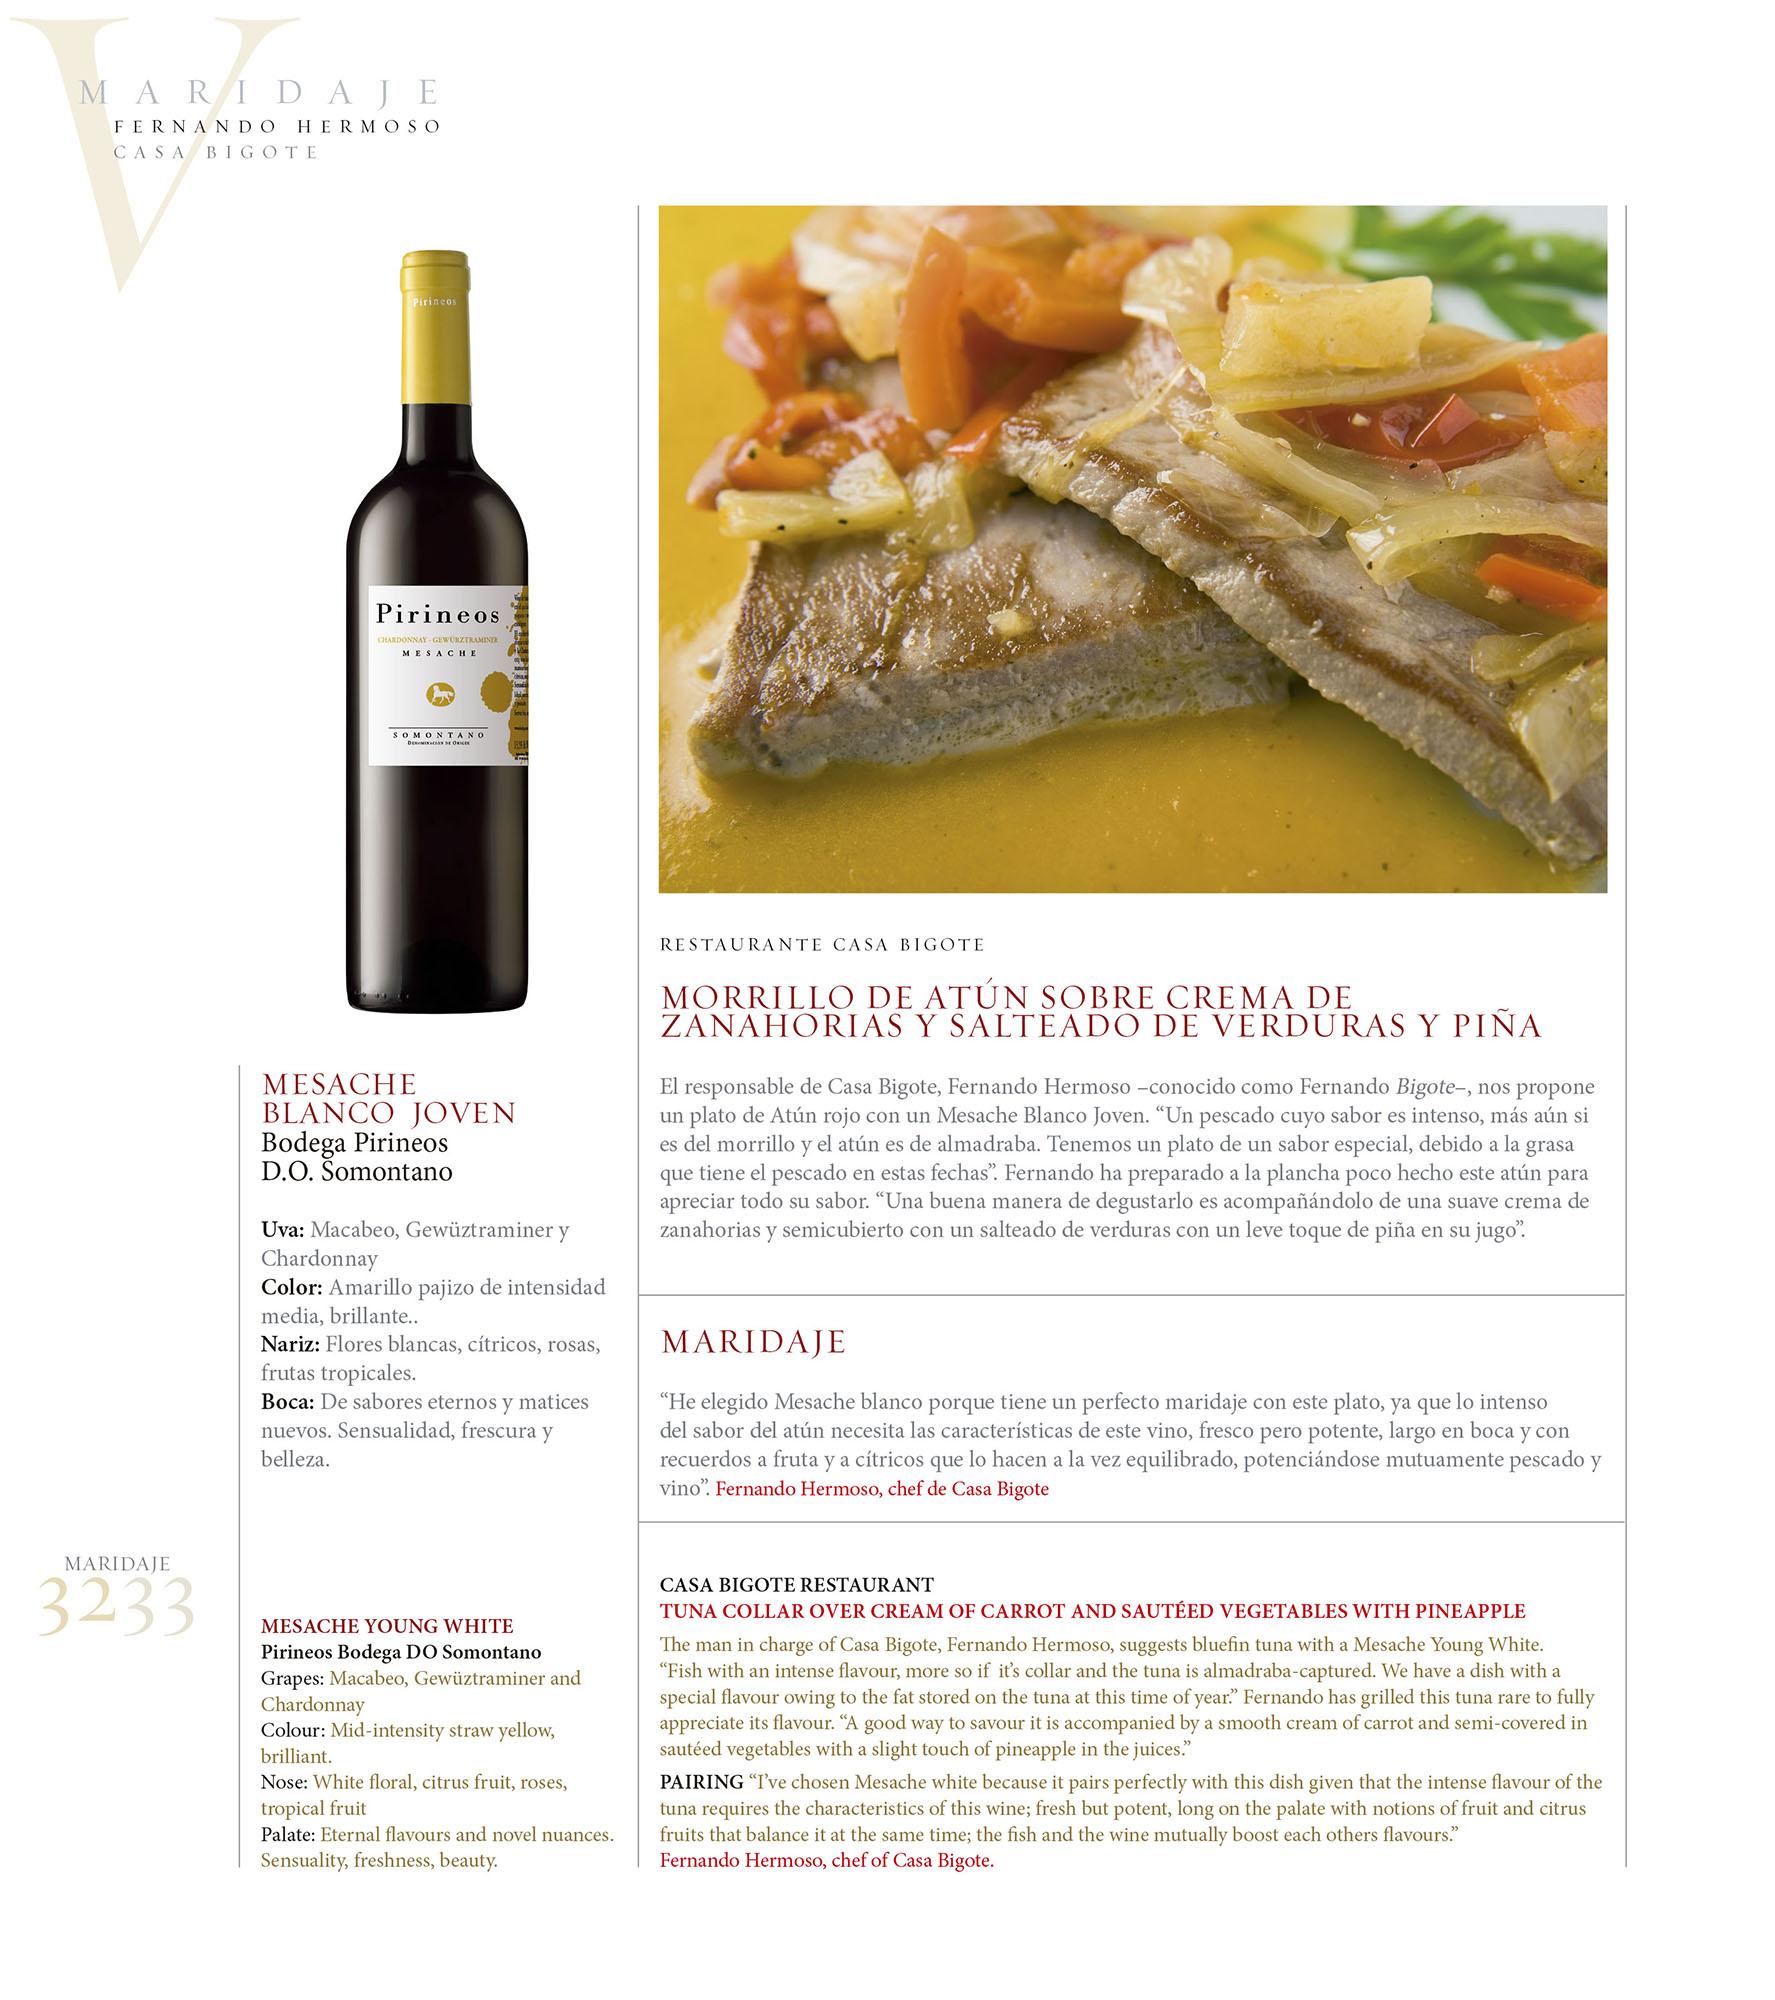 Maridaje - Casa Bigote | Revista ORO | jun 2009